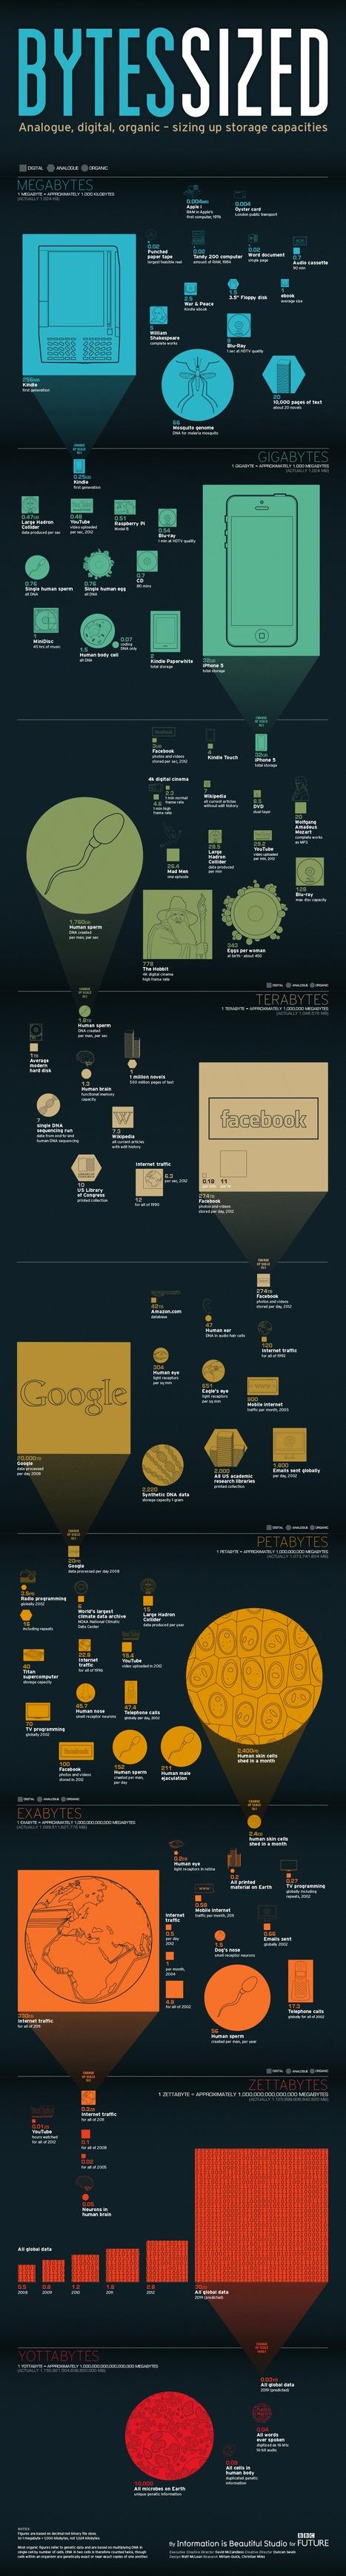 Bytes Sized: Information Storage, Visualized [infographic] | Communication design | Scoop.it